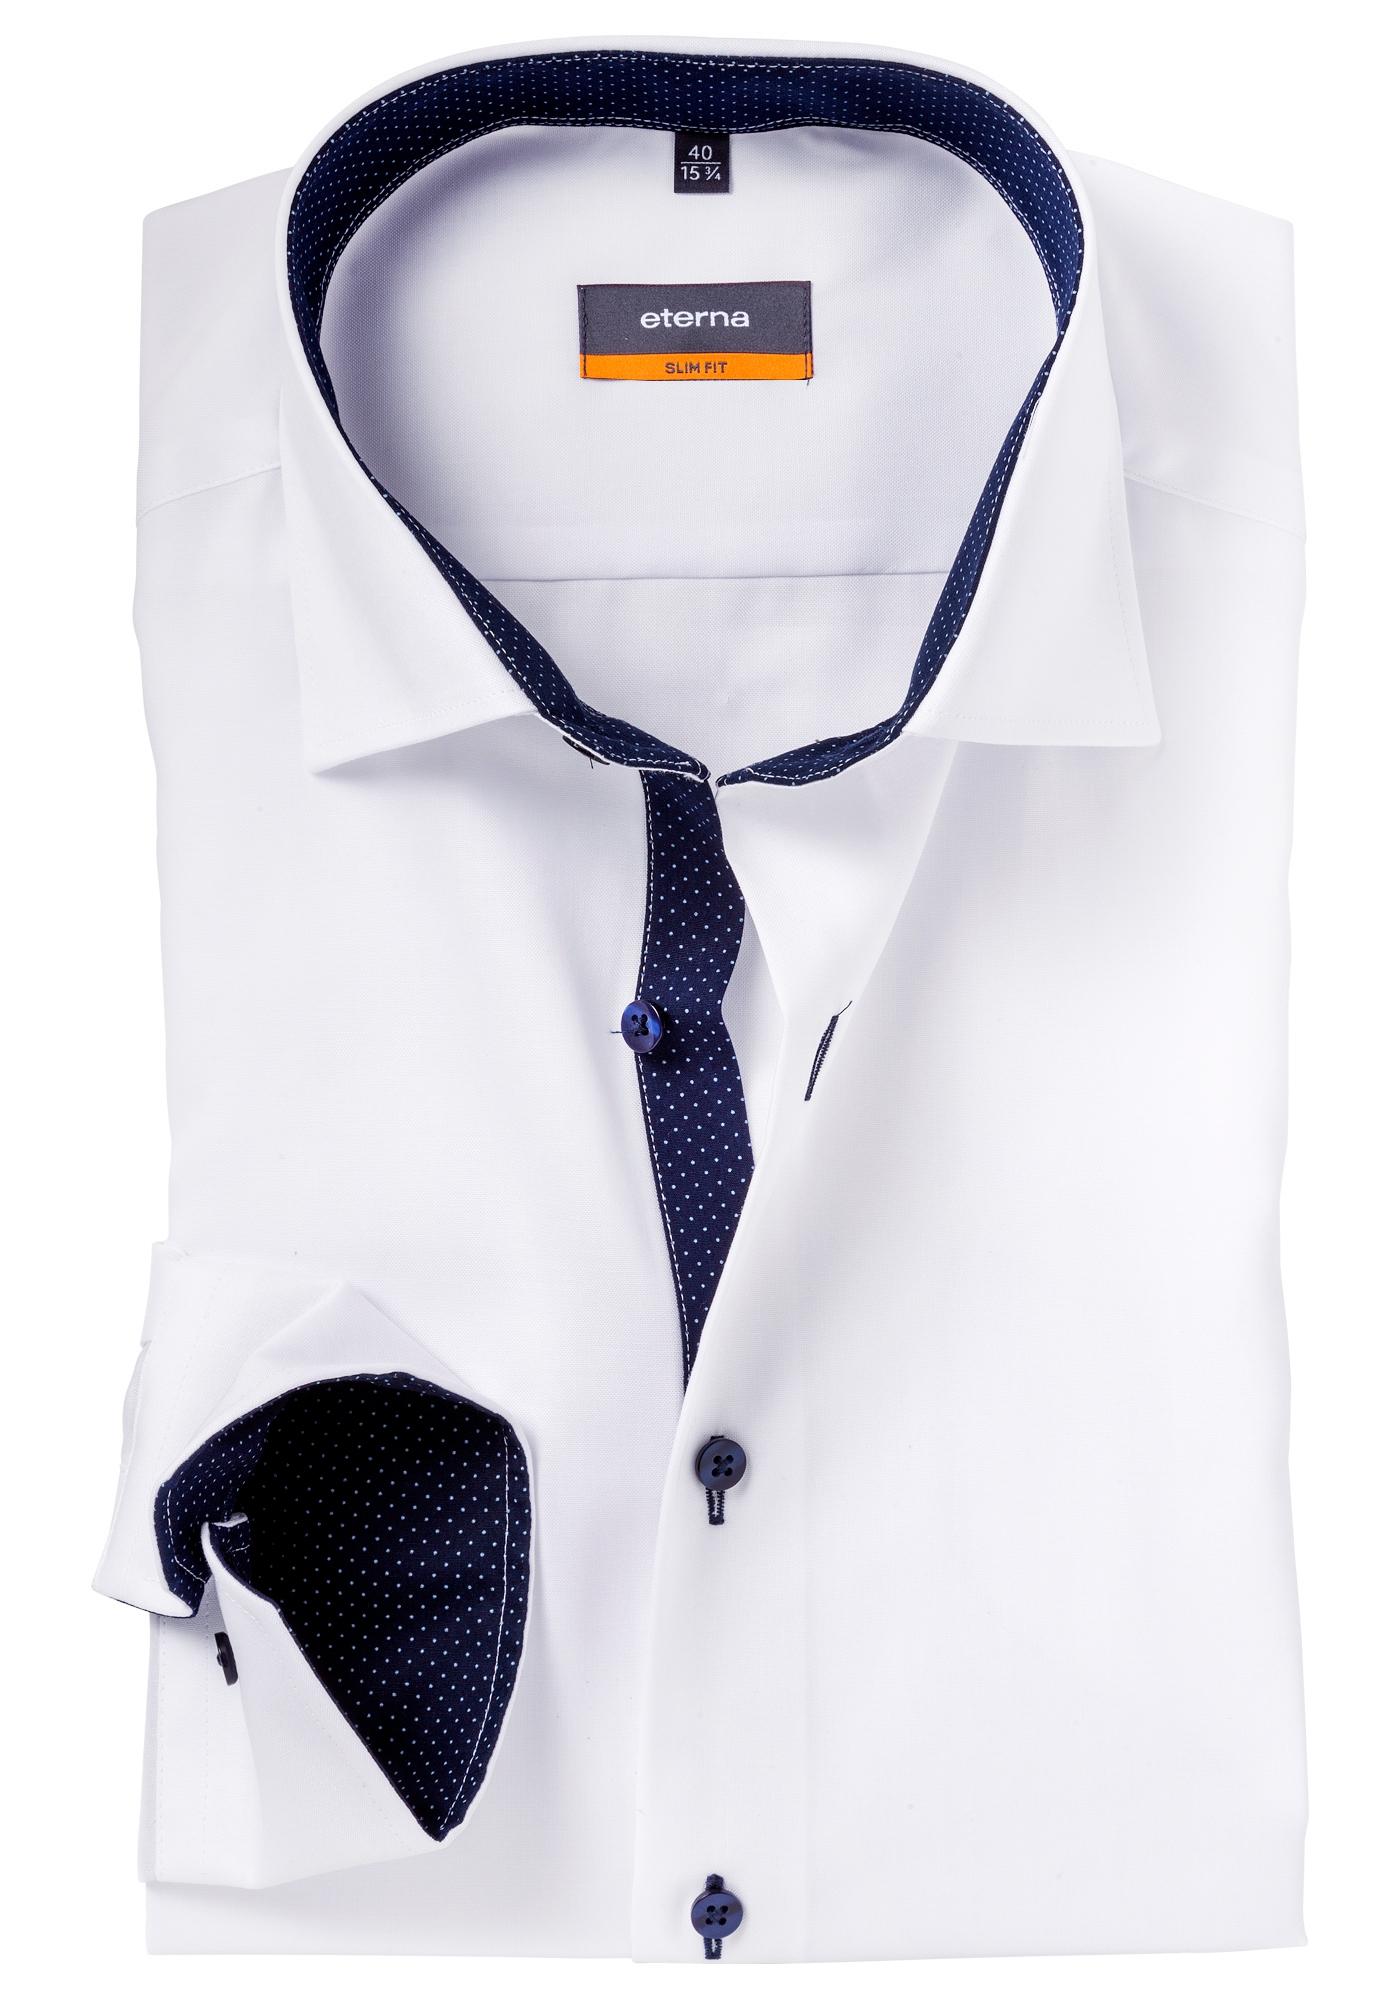 Overhemd Wit Slim Fit.Eterna Slim Fit Overhemd Wit Fijn Oxford Contrast Gratis Bezorgd